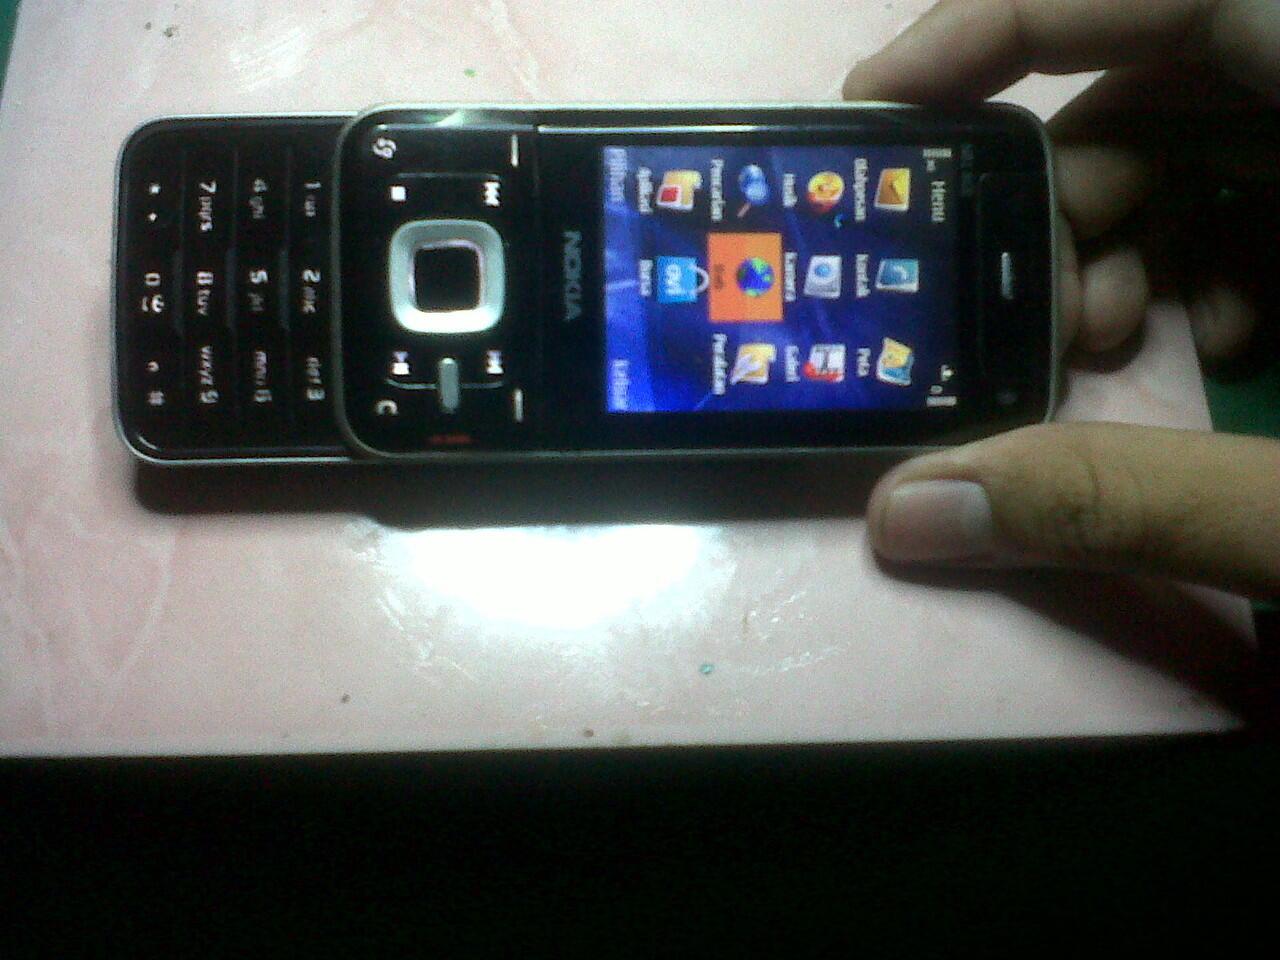 Nokia Batangan n81, 3500c, 6600